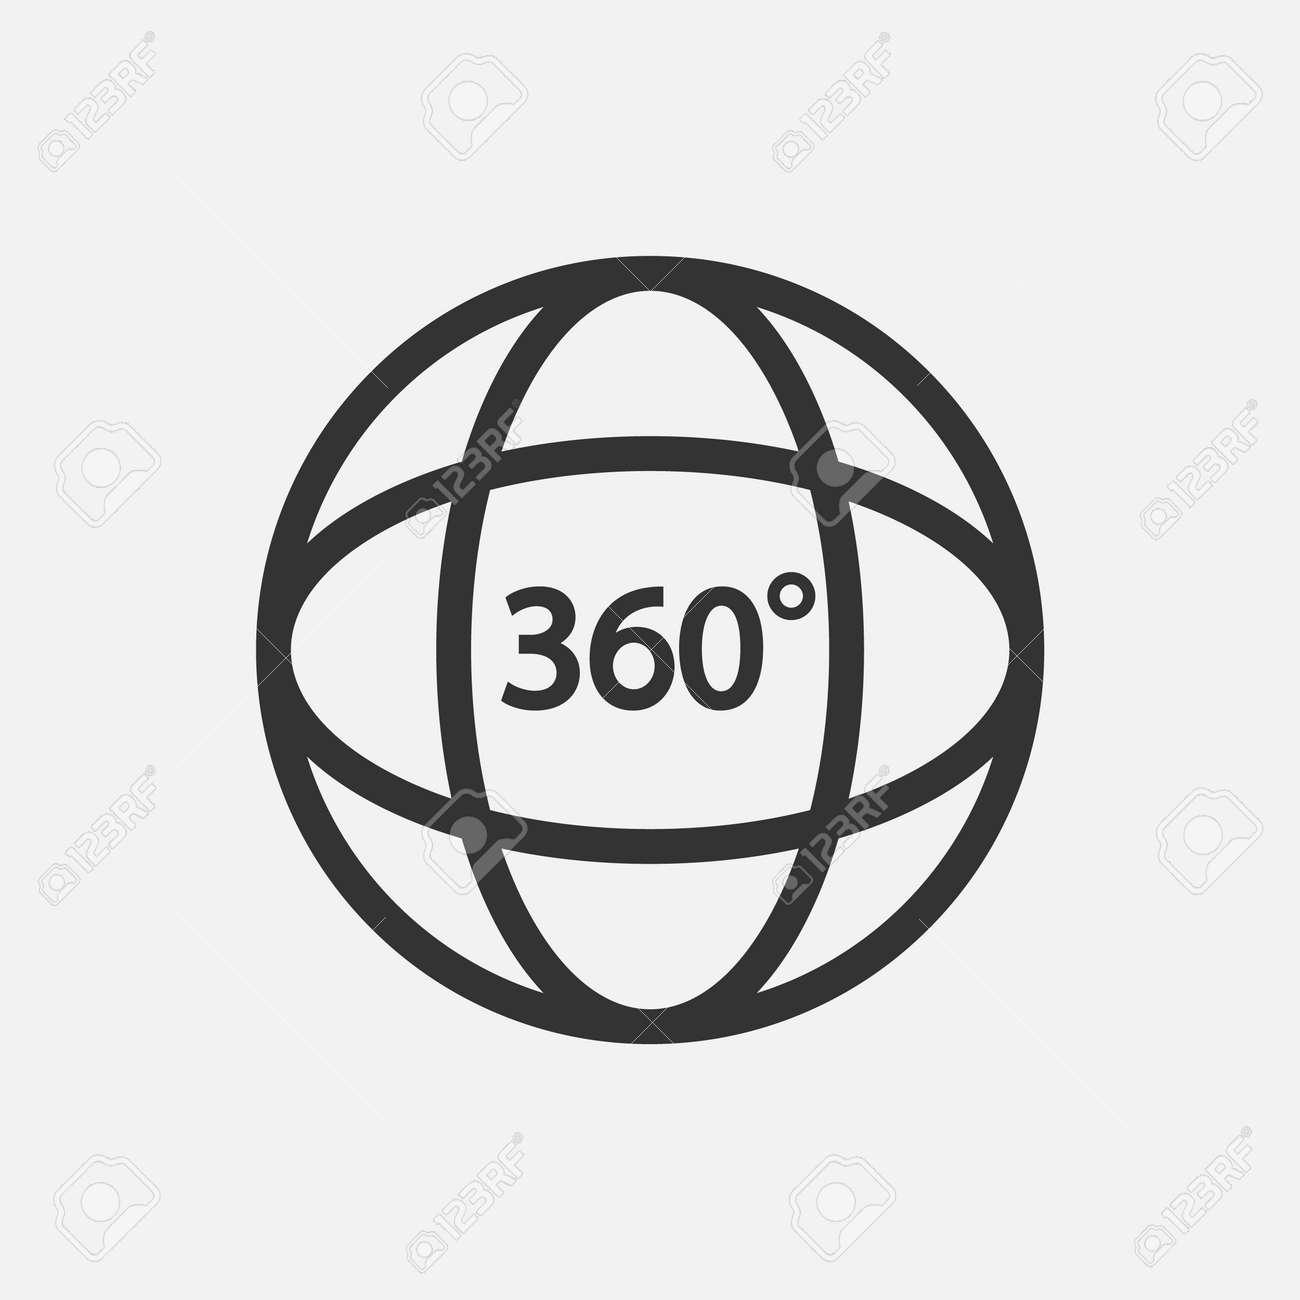 360 Icon. 360 degree view symbol Vector illustration. - 164871670